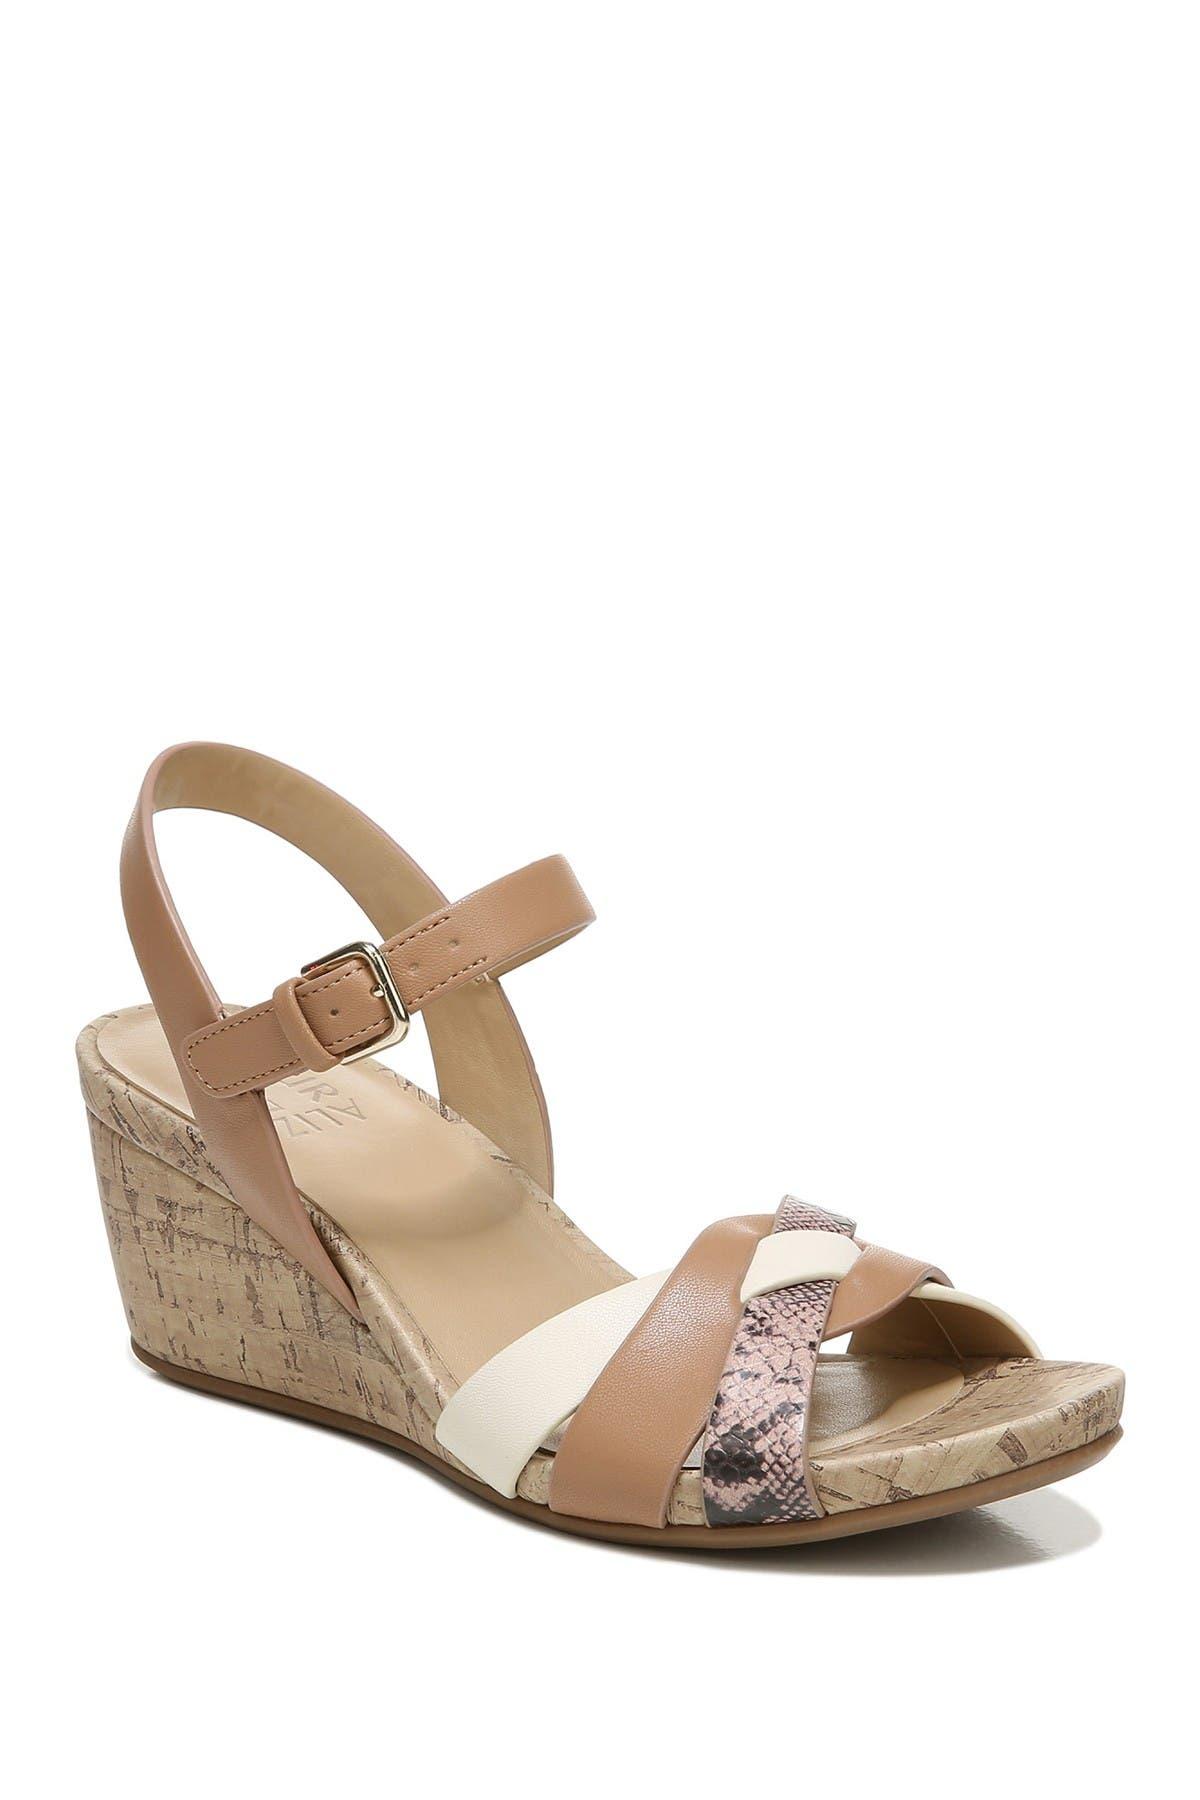 Naturalizer Mid heels ADELINA WEDGE SANDAL